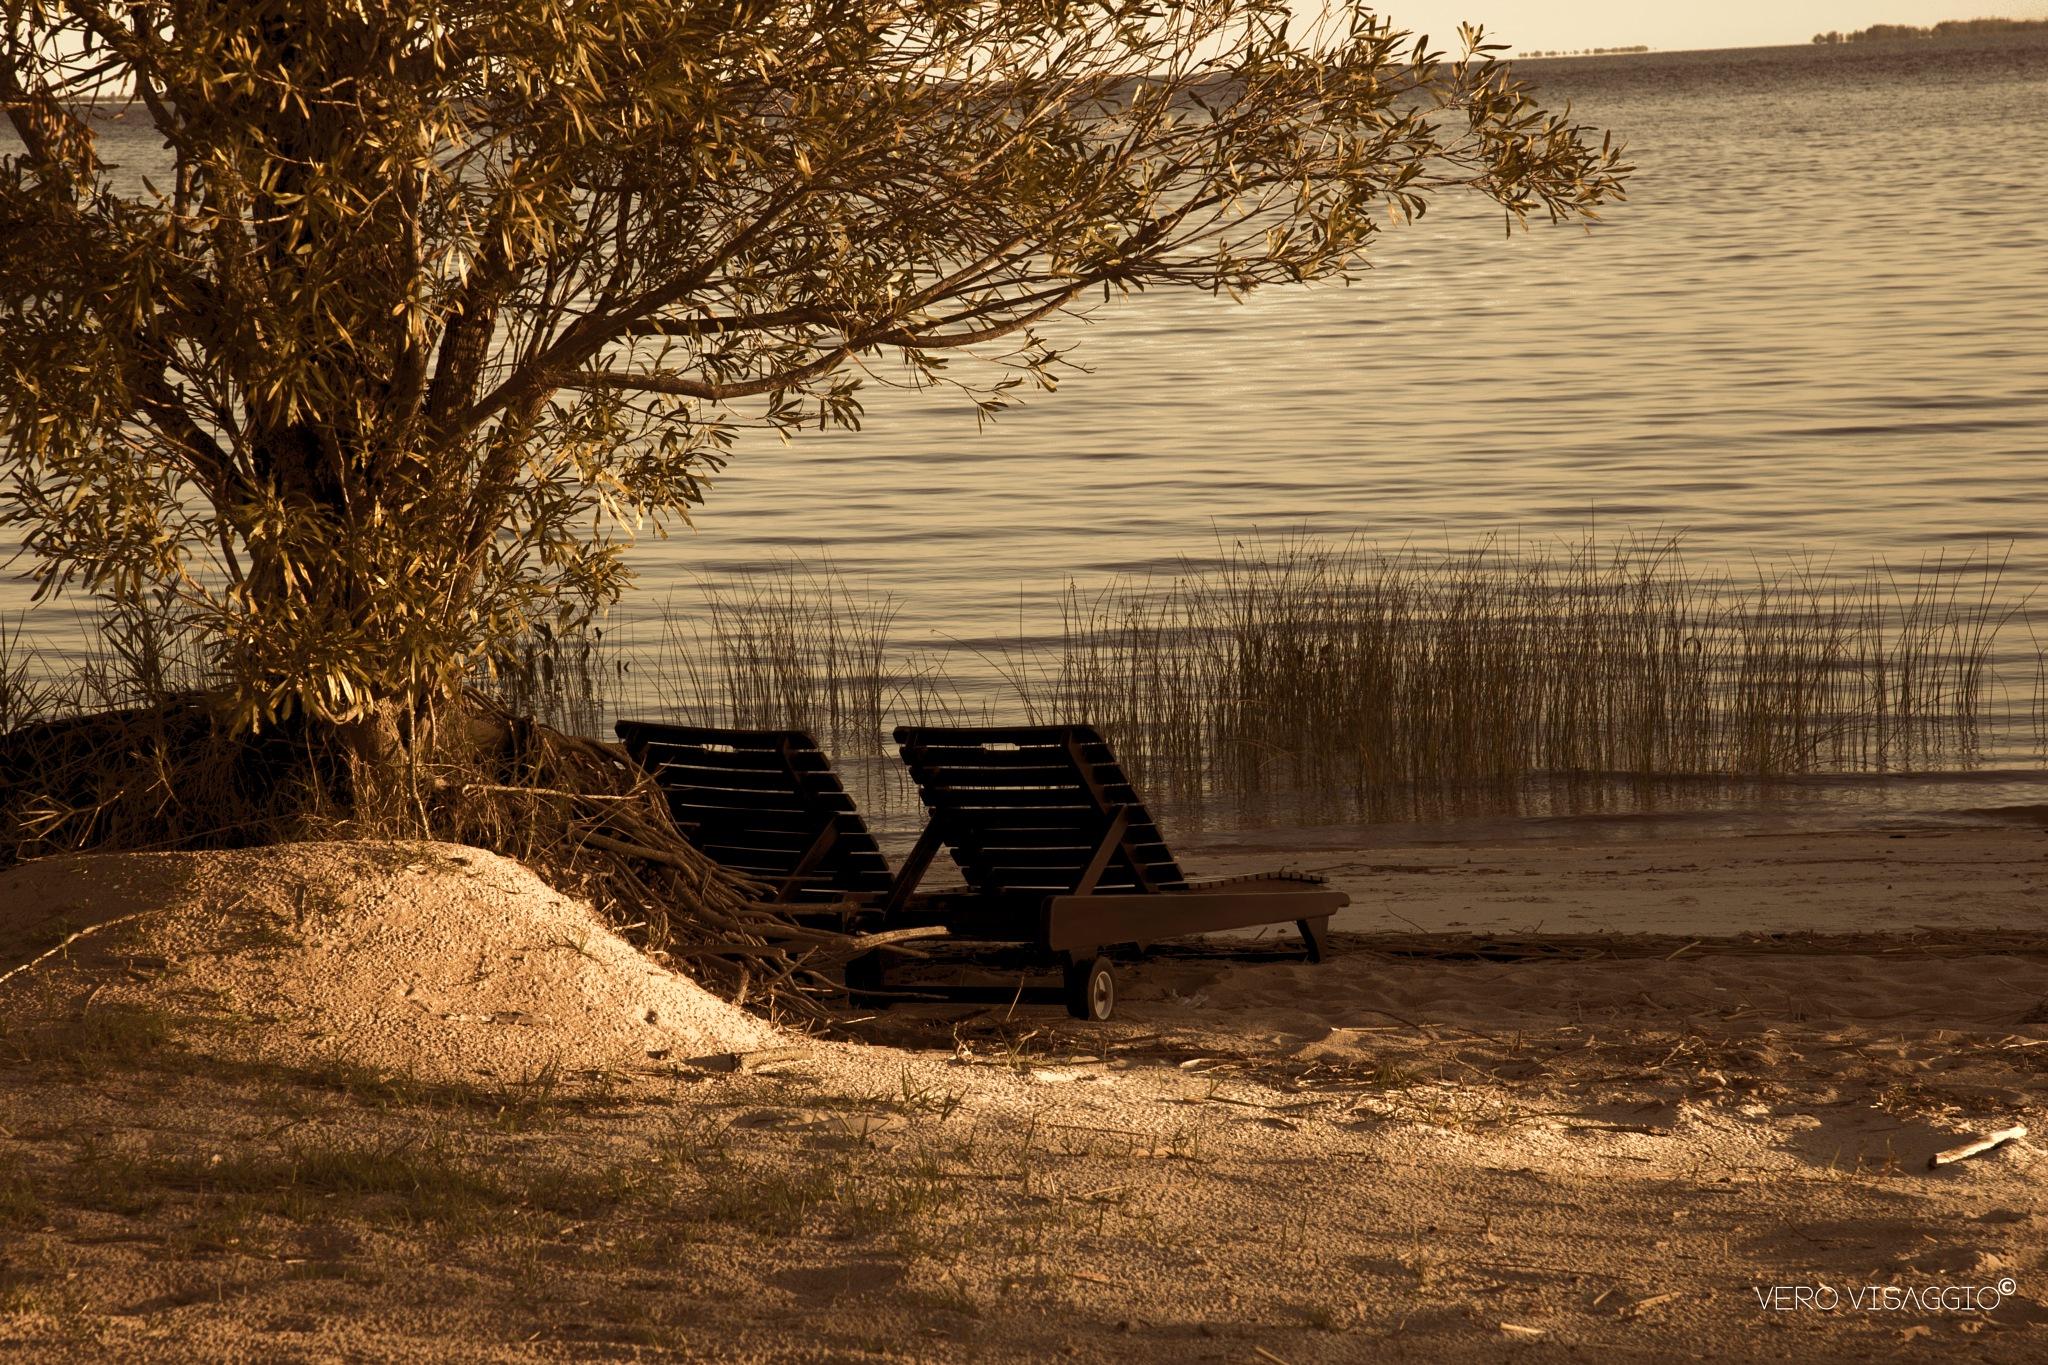 Calmness by verovisaggio